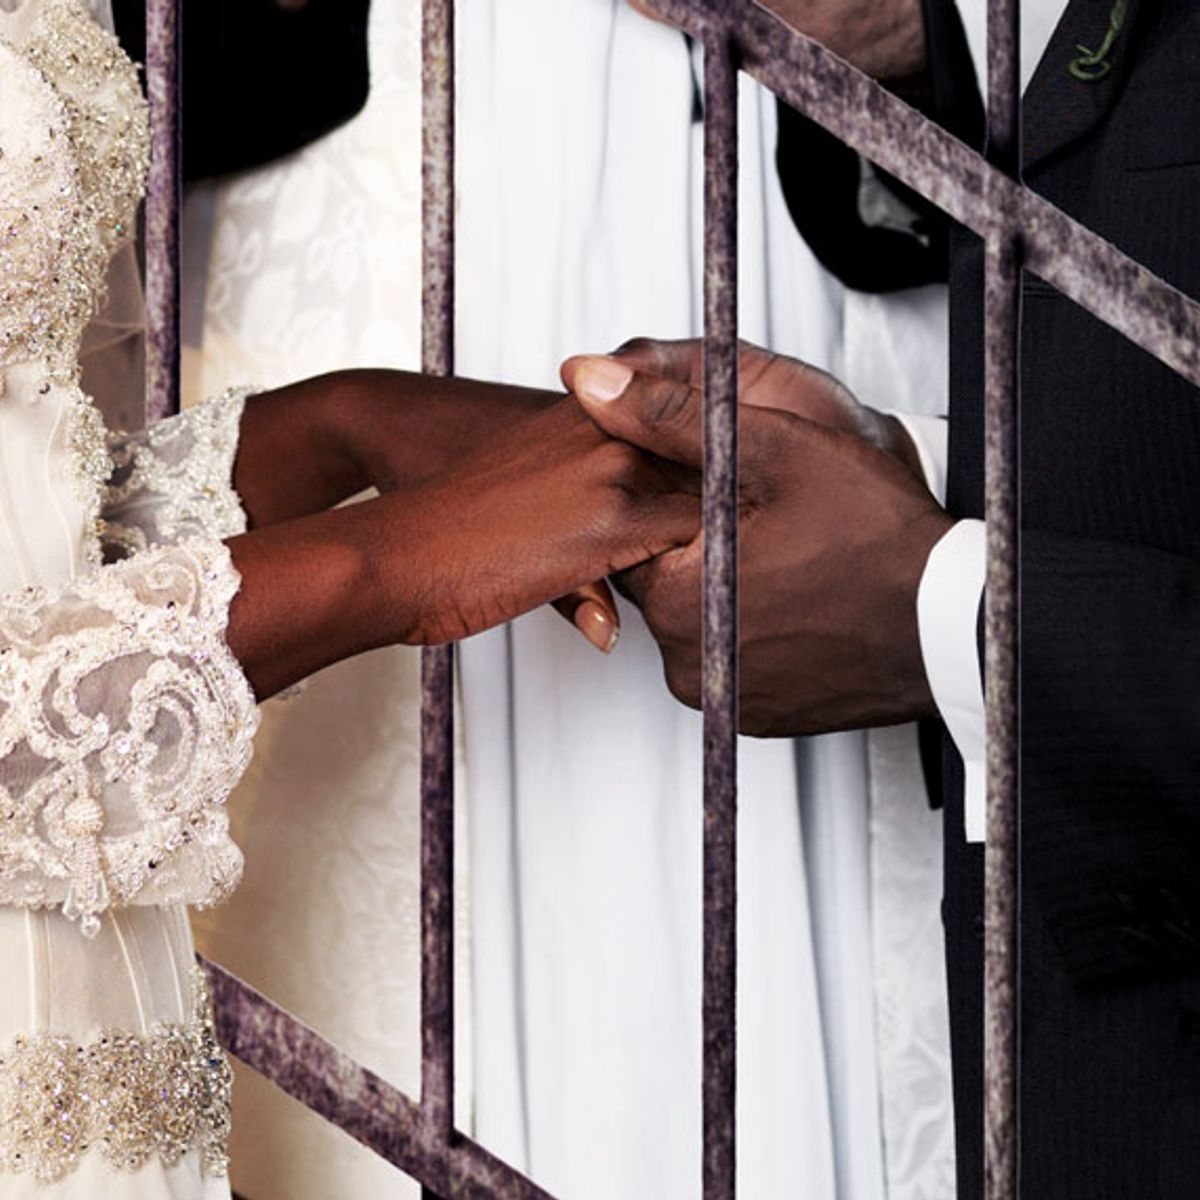 Image result for wedding in prison